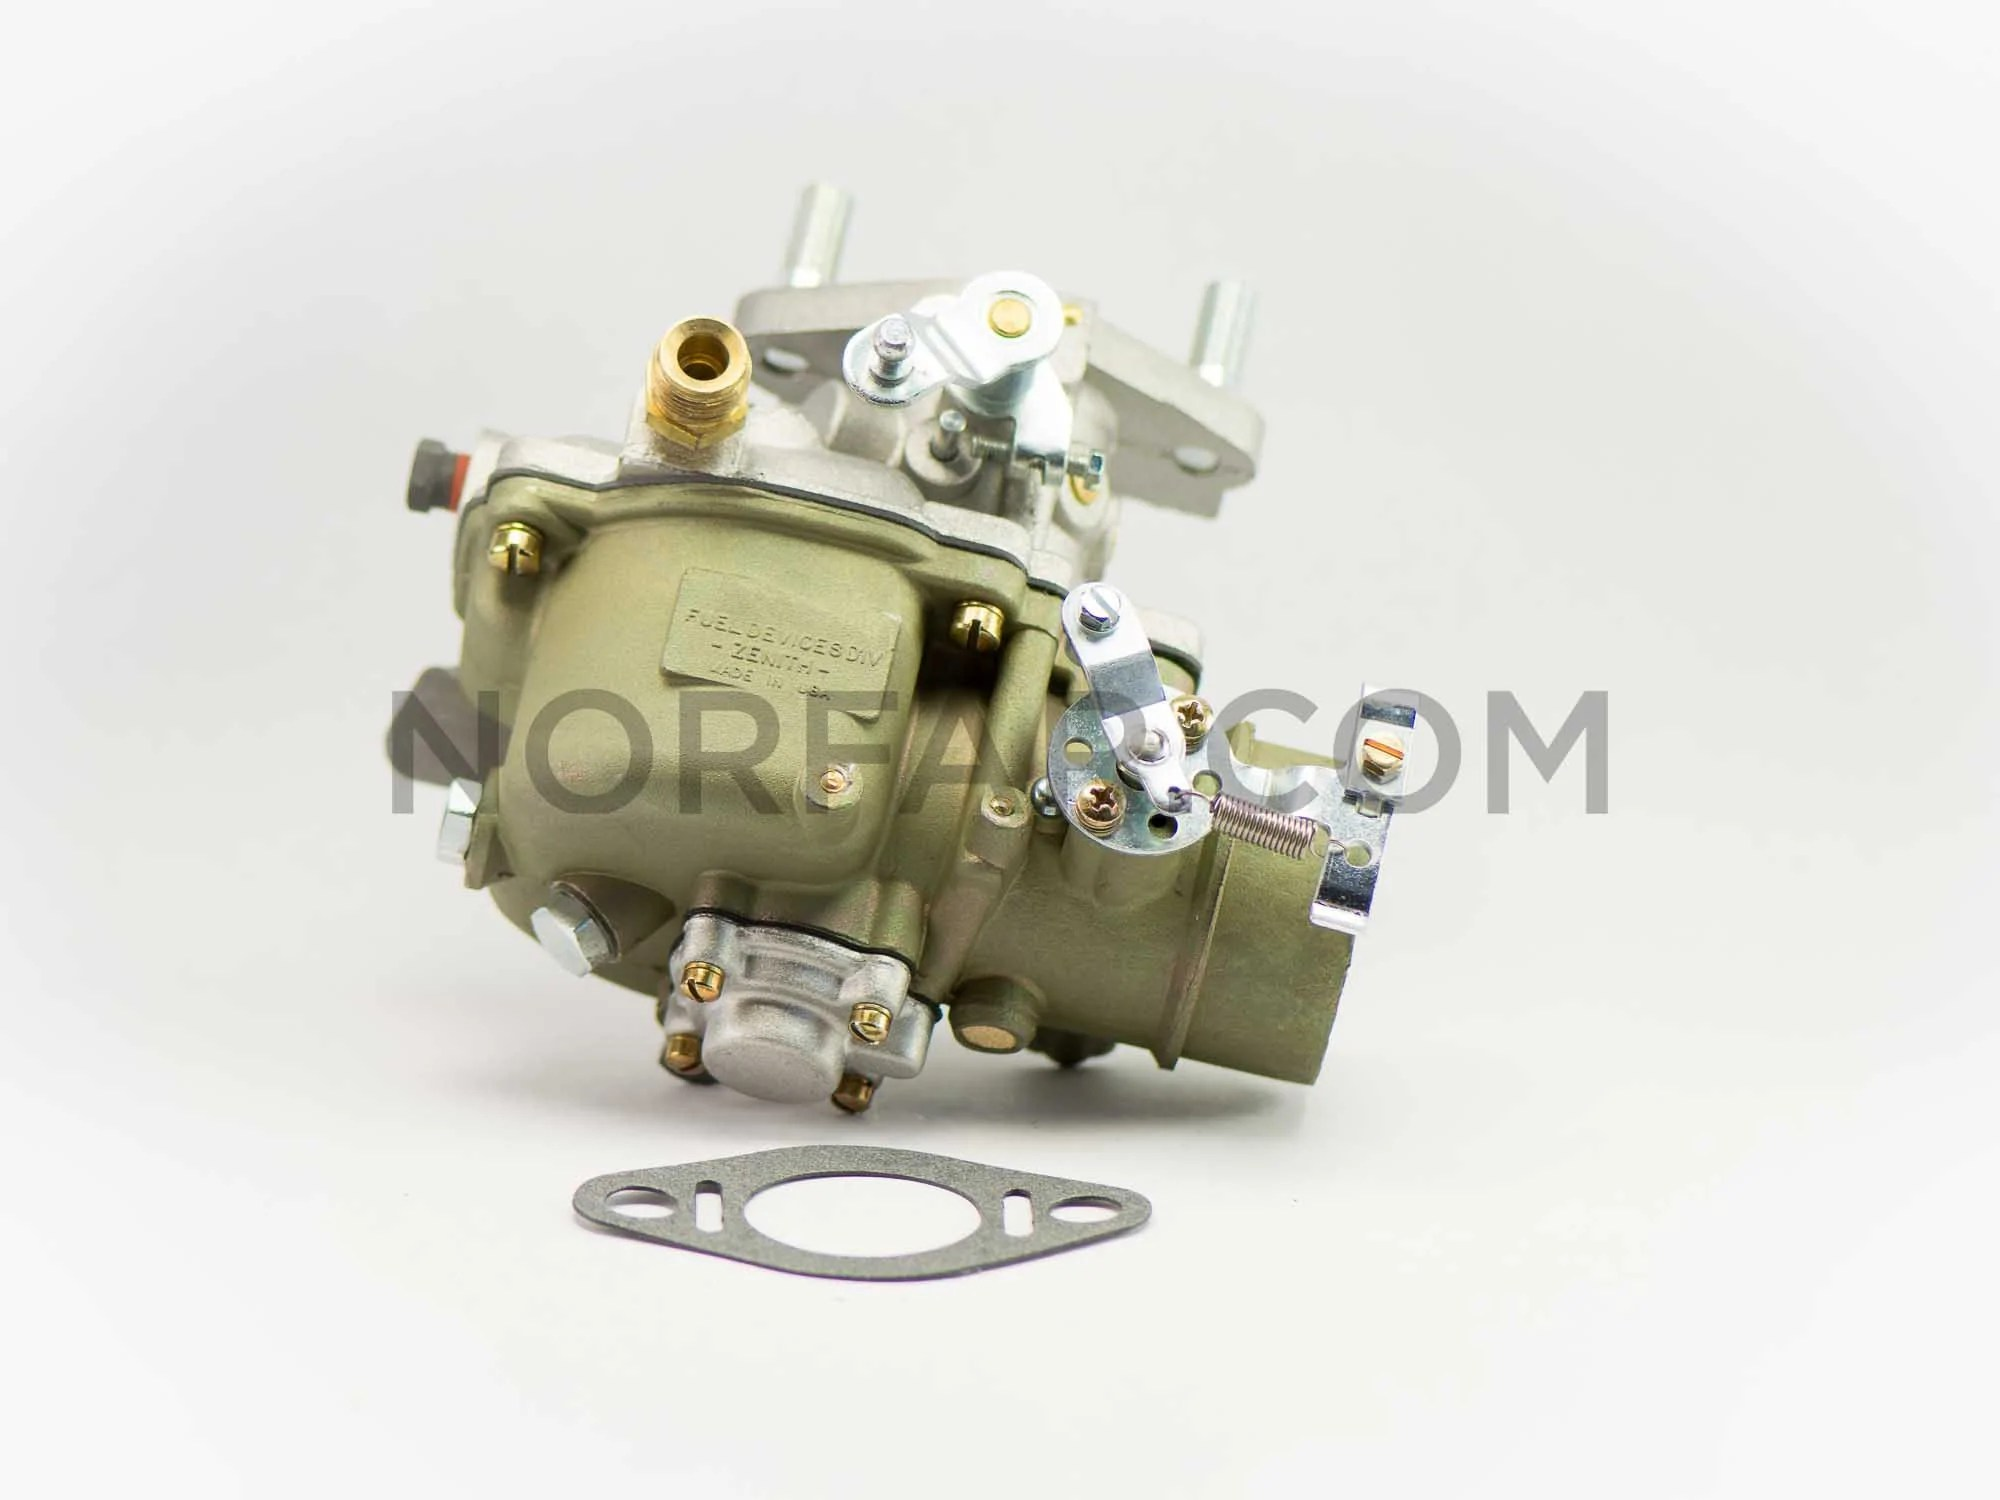 zenith 13916 carburetor ford 3000 tractor carburetor  [ 2000 x 1500 Pixel ]